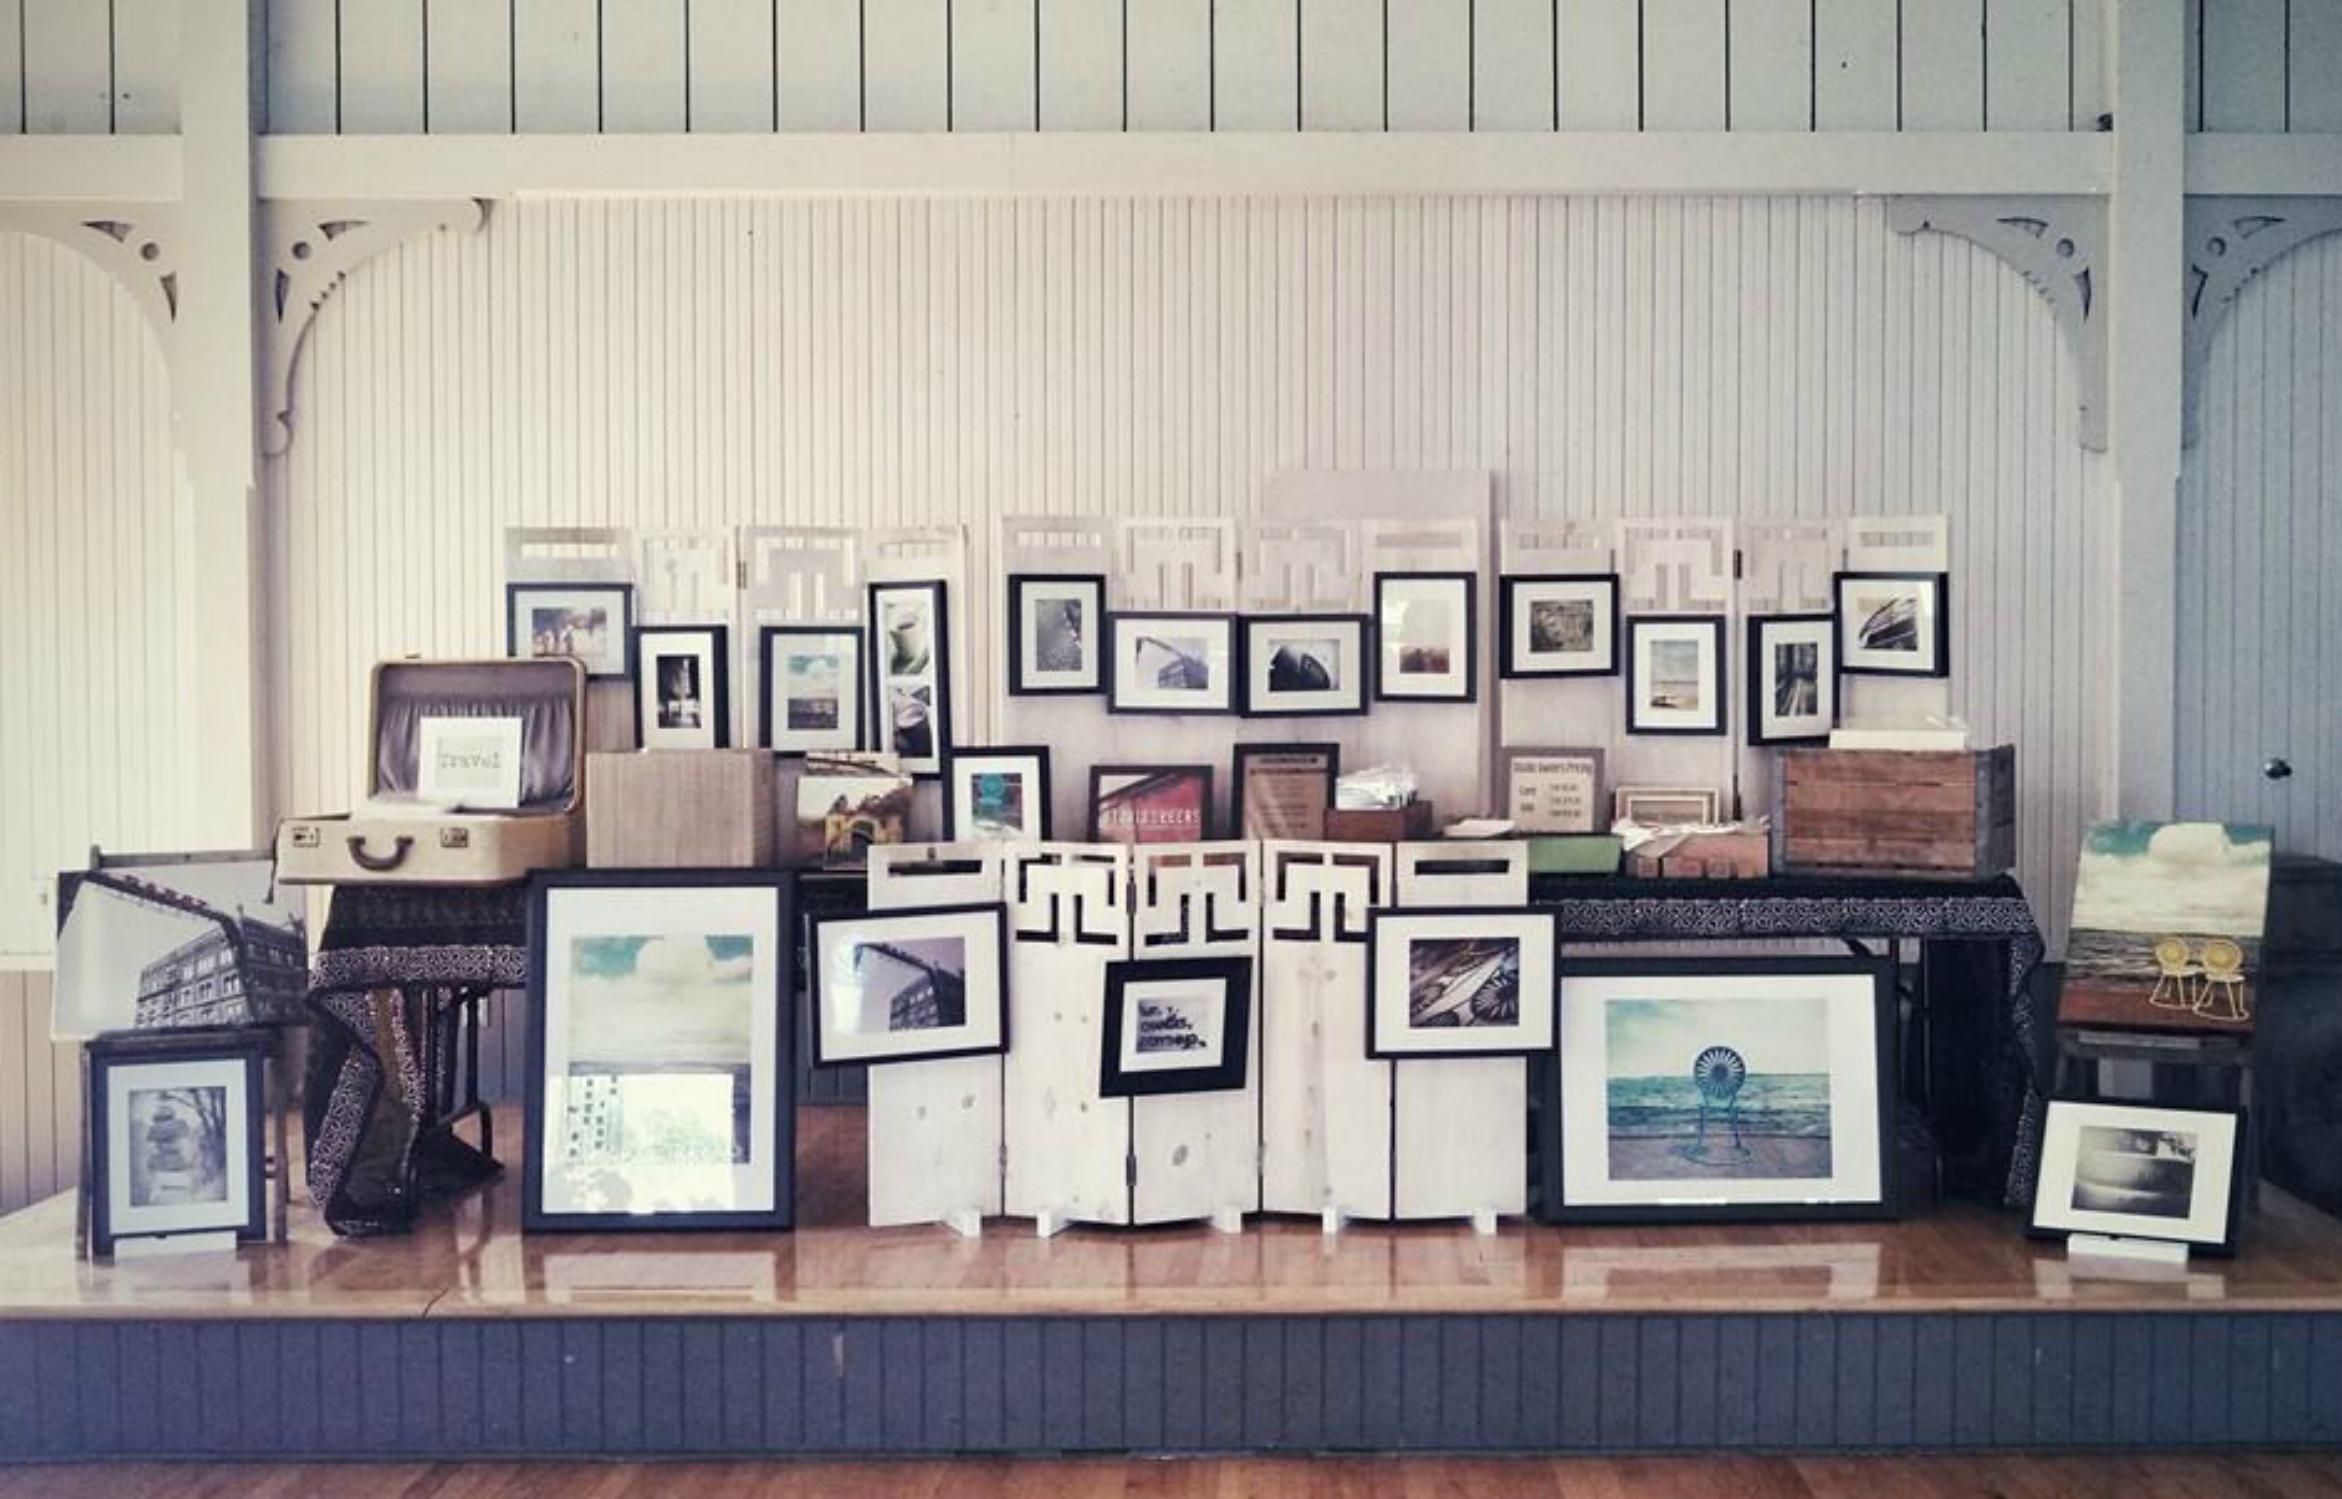 Booth Image.jpg